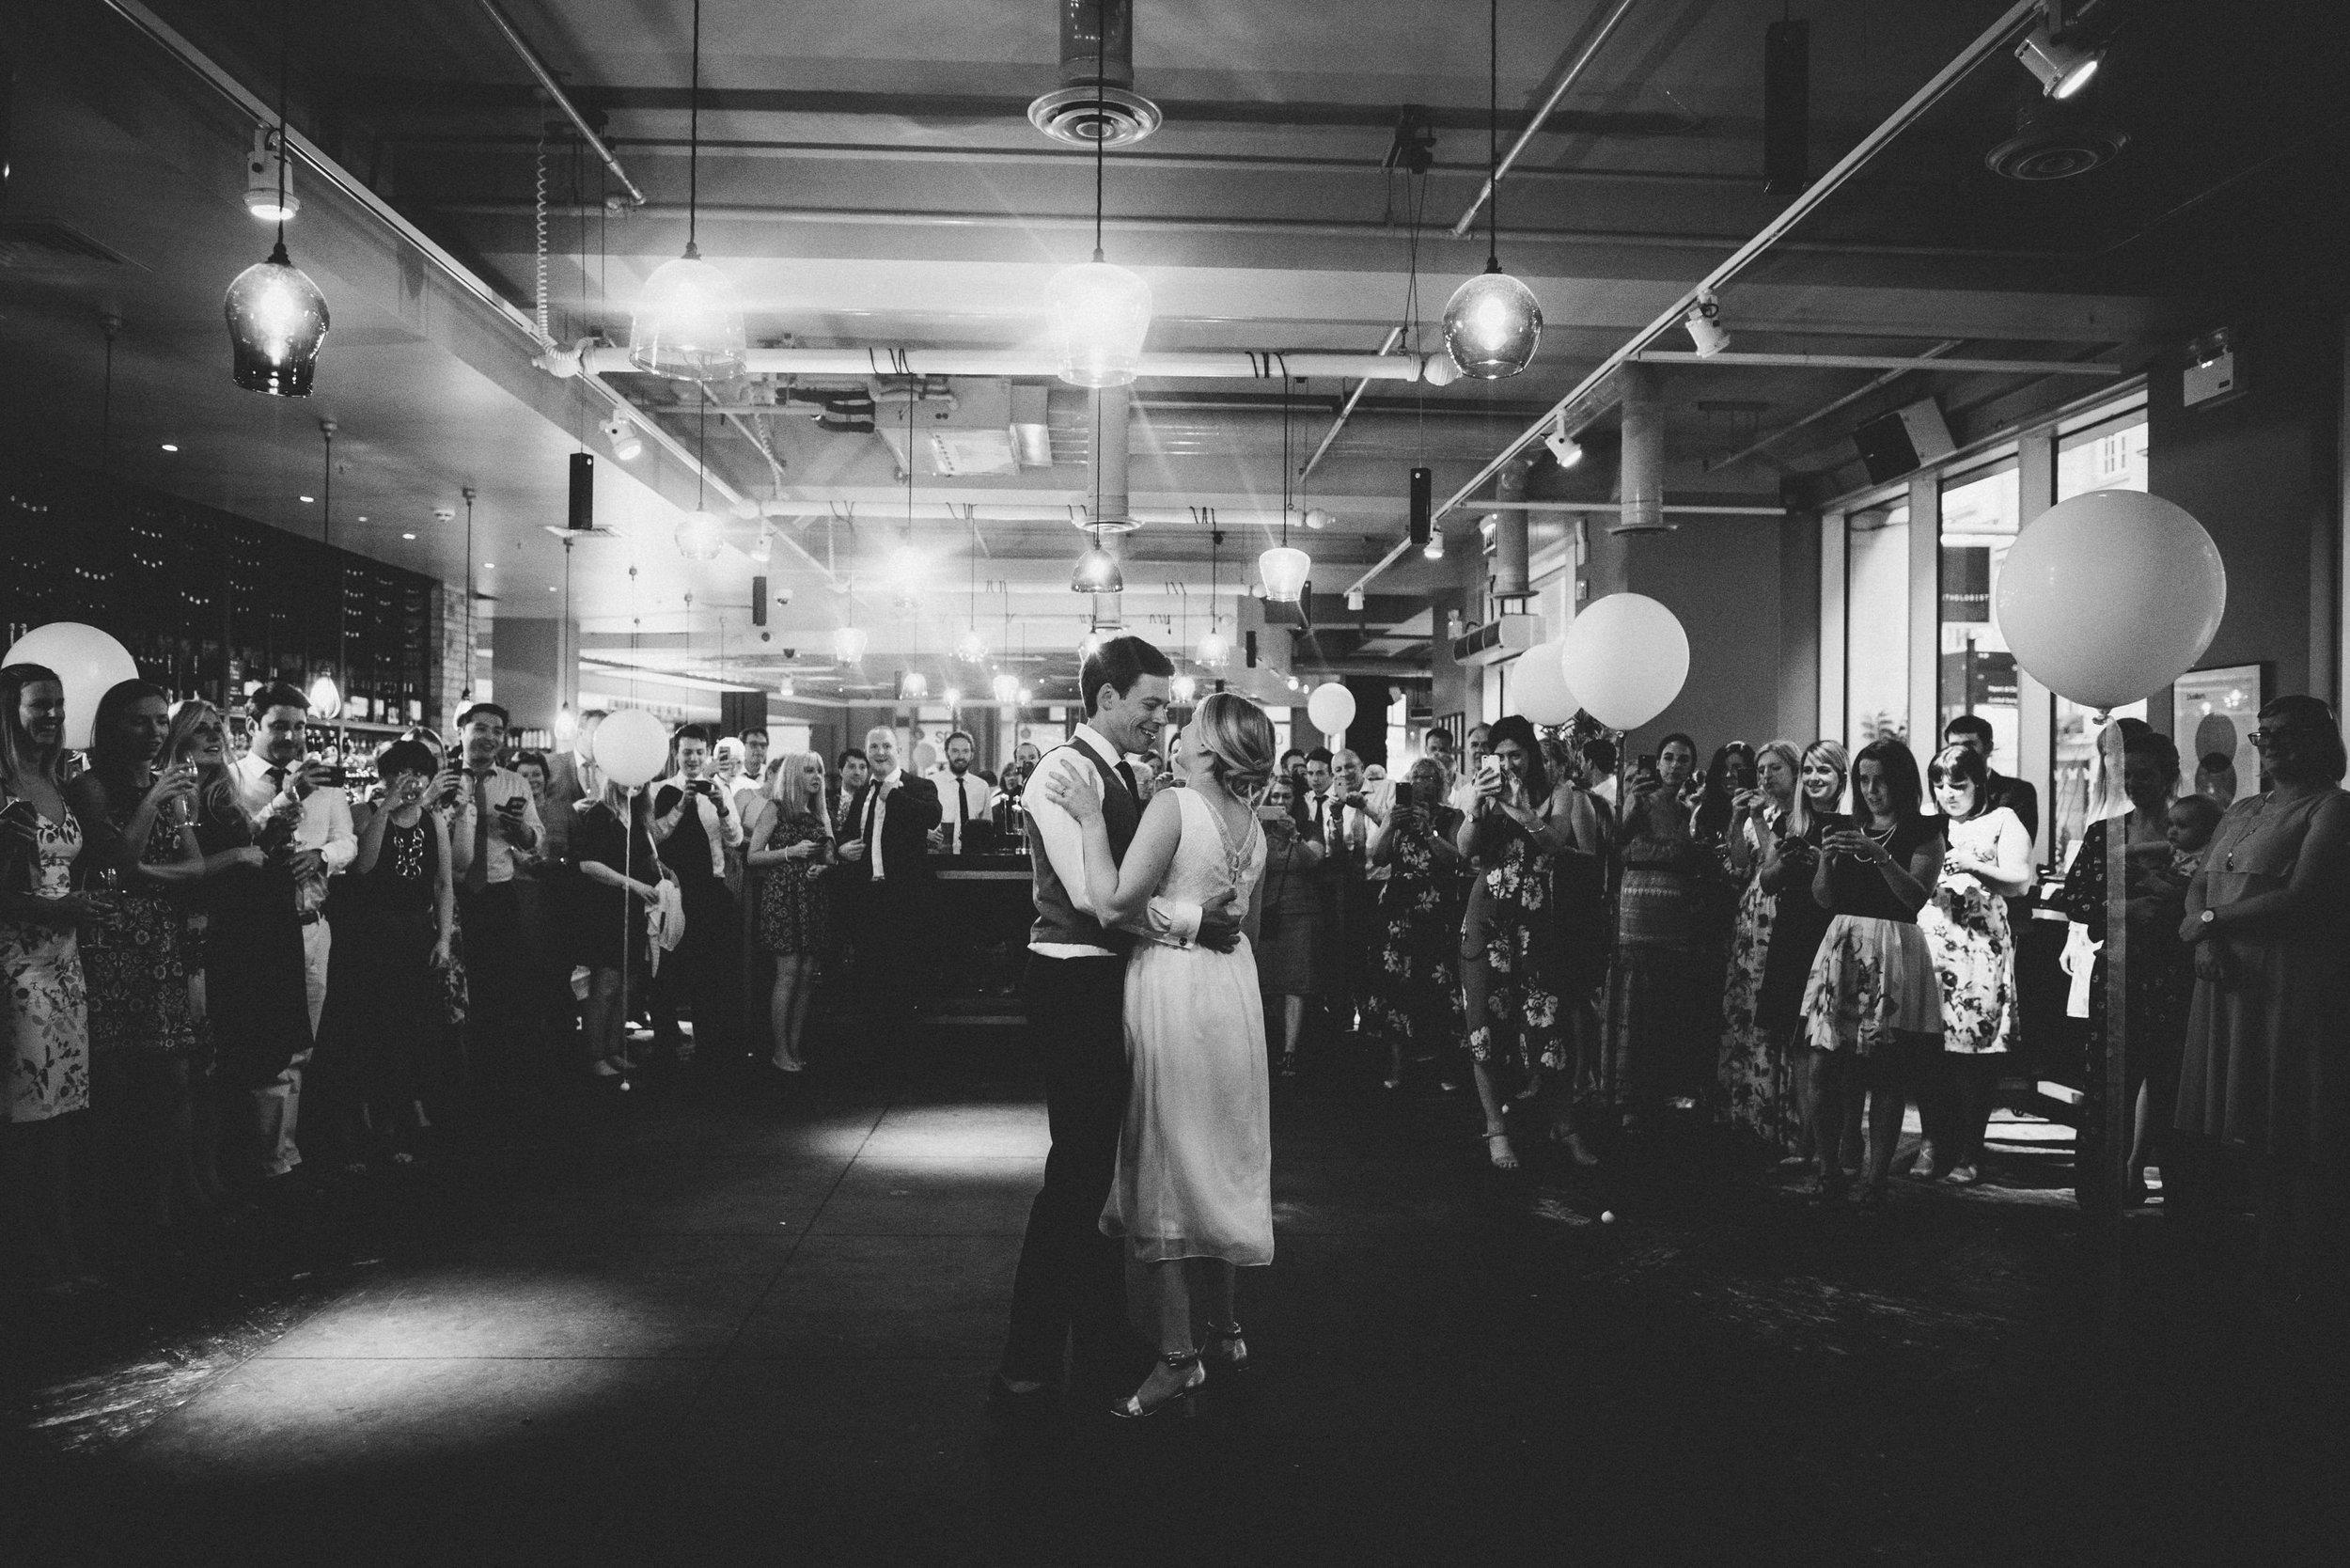 0162-LISA-DEVINE-PHOTOGRAPHY-ALTERNATIVE-WEDDING-PHOTOGRAPHY-SCOTLAND-DESTINATION-WEDDINGS-GLASGOW-WEDDINGS-COOL-WEDDINGS-STYLISH-WEDDINGS.JPG